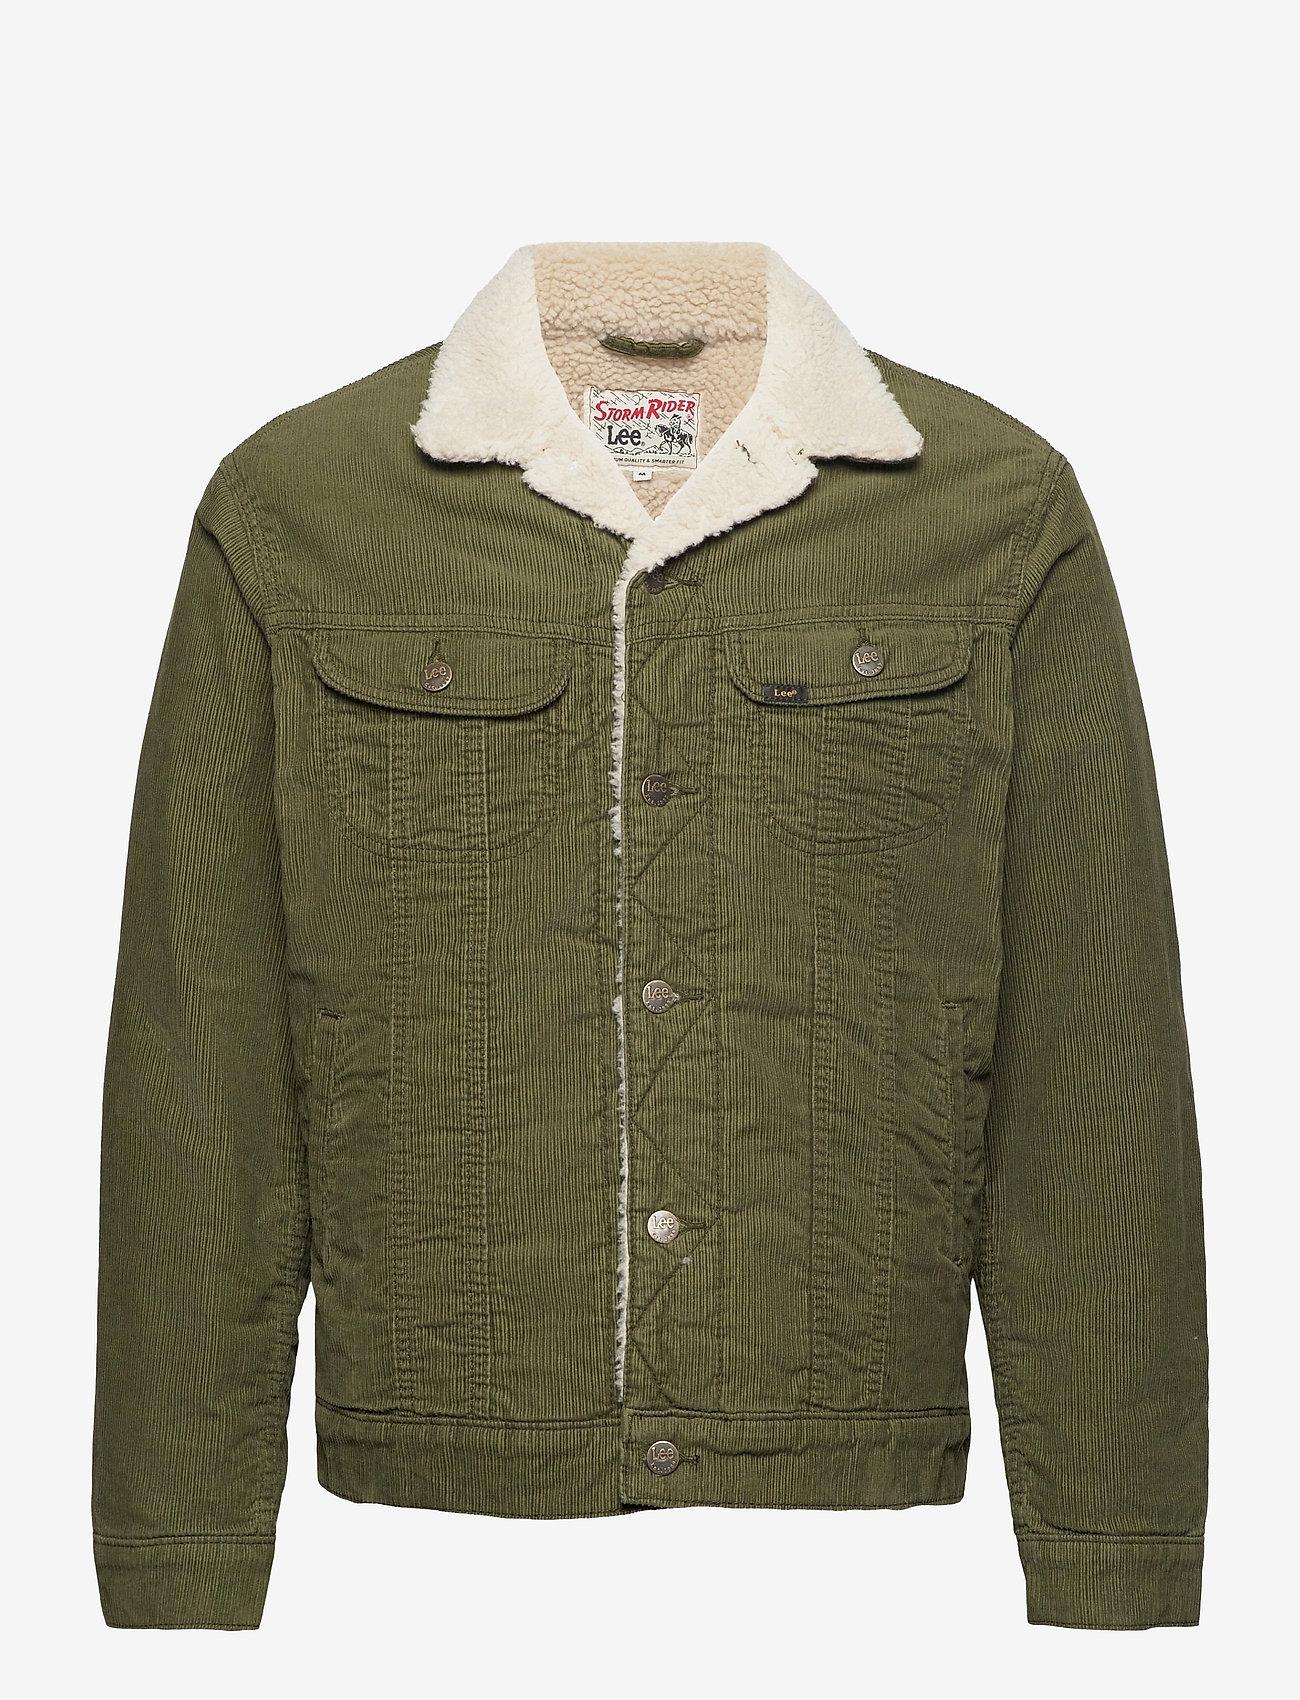 Lee Jeans - SHERPA JACKET - denim jackets - olive green - 0